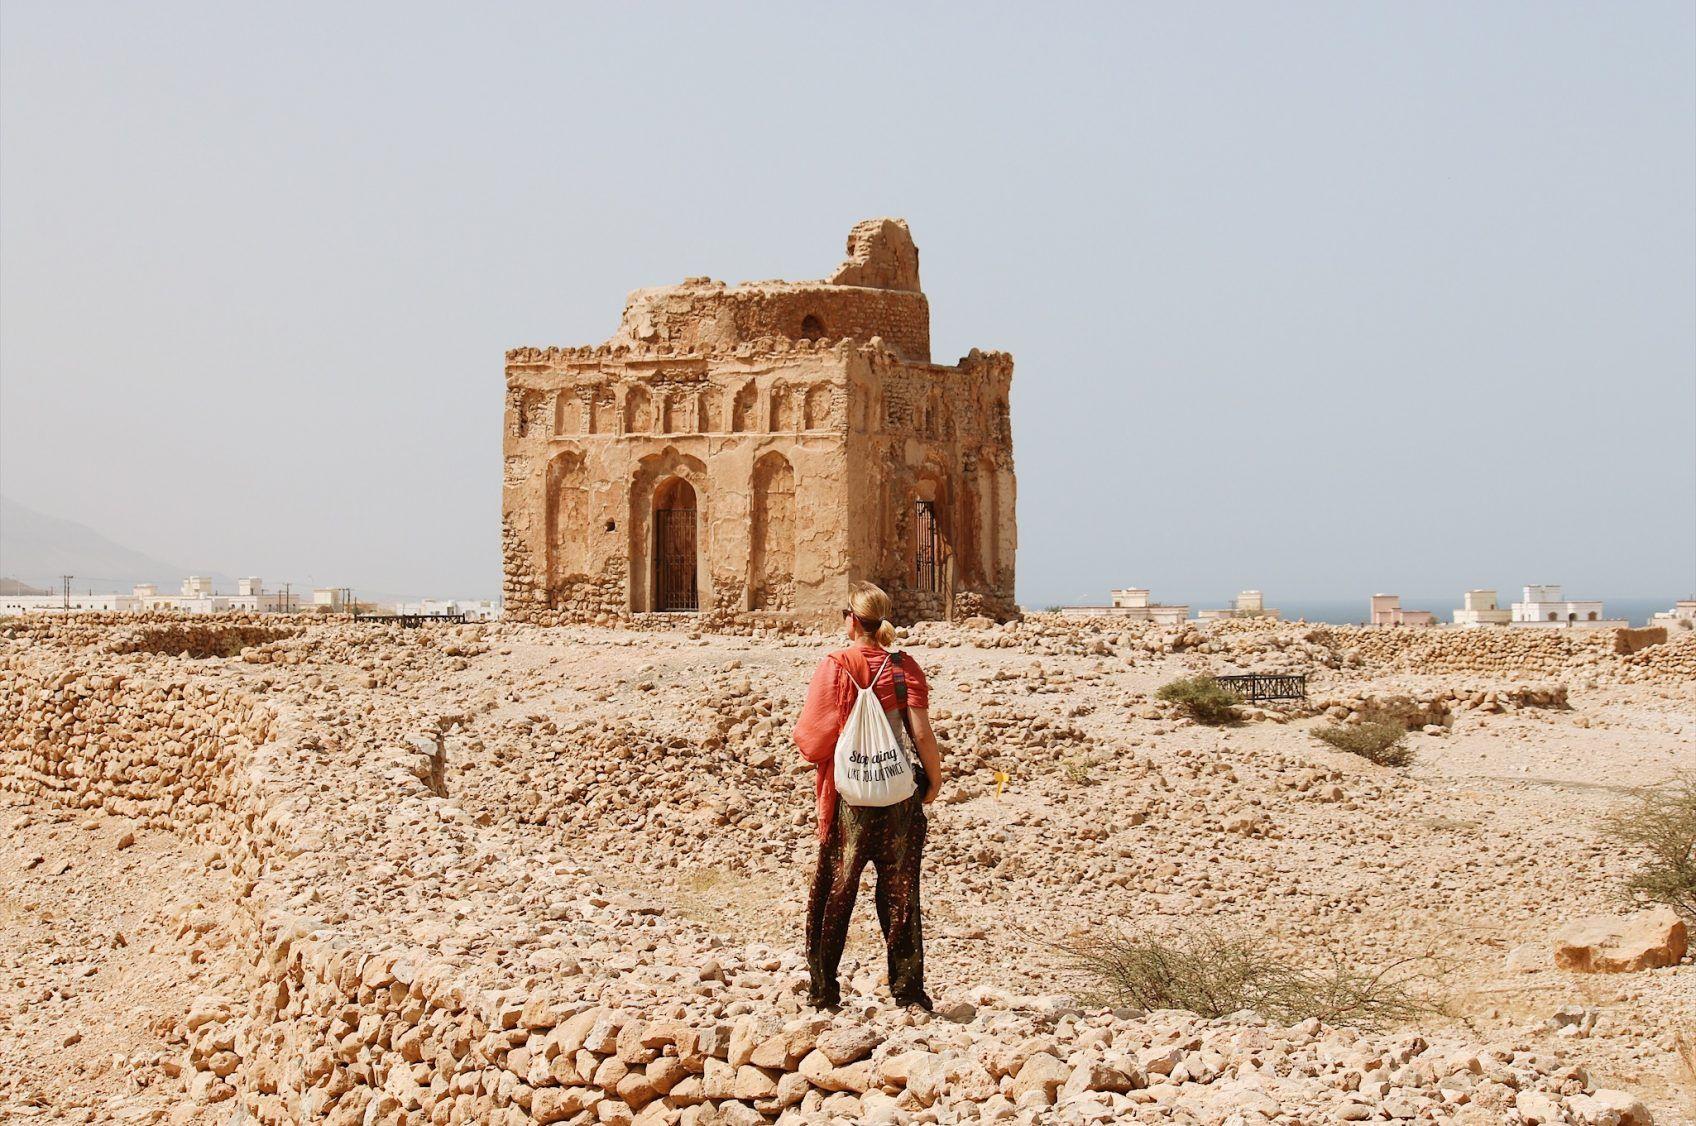 Urlaub Im Oman Gefährlich